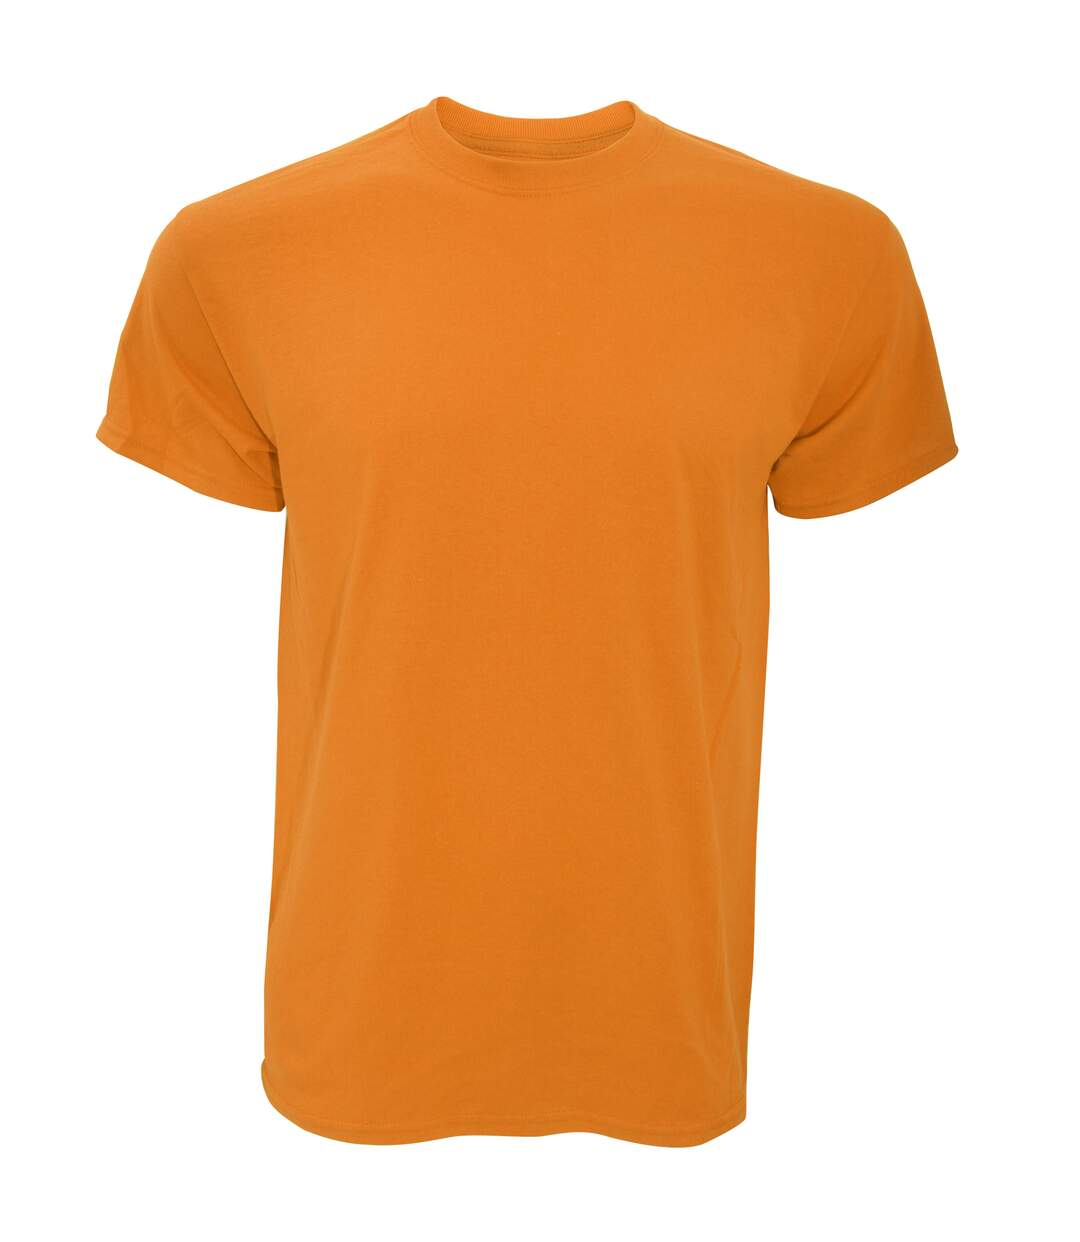 Gildan DryBlend - T-shirt de sport - Homme (Orange) - UTBC3193